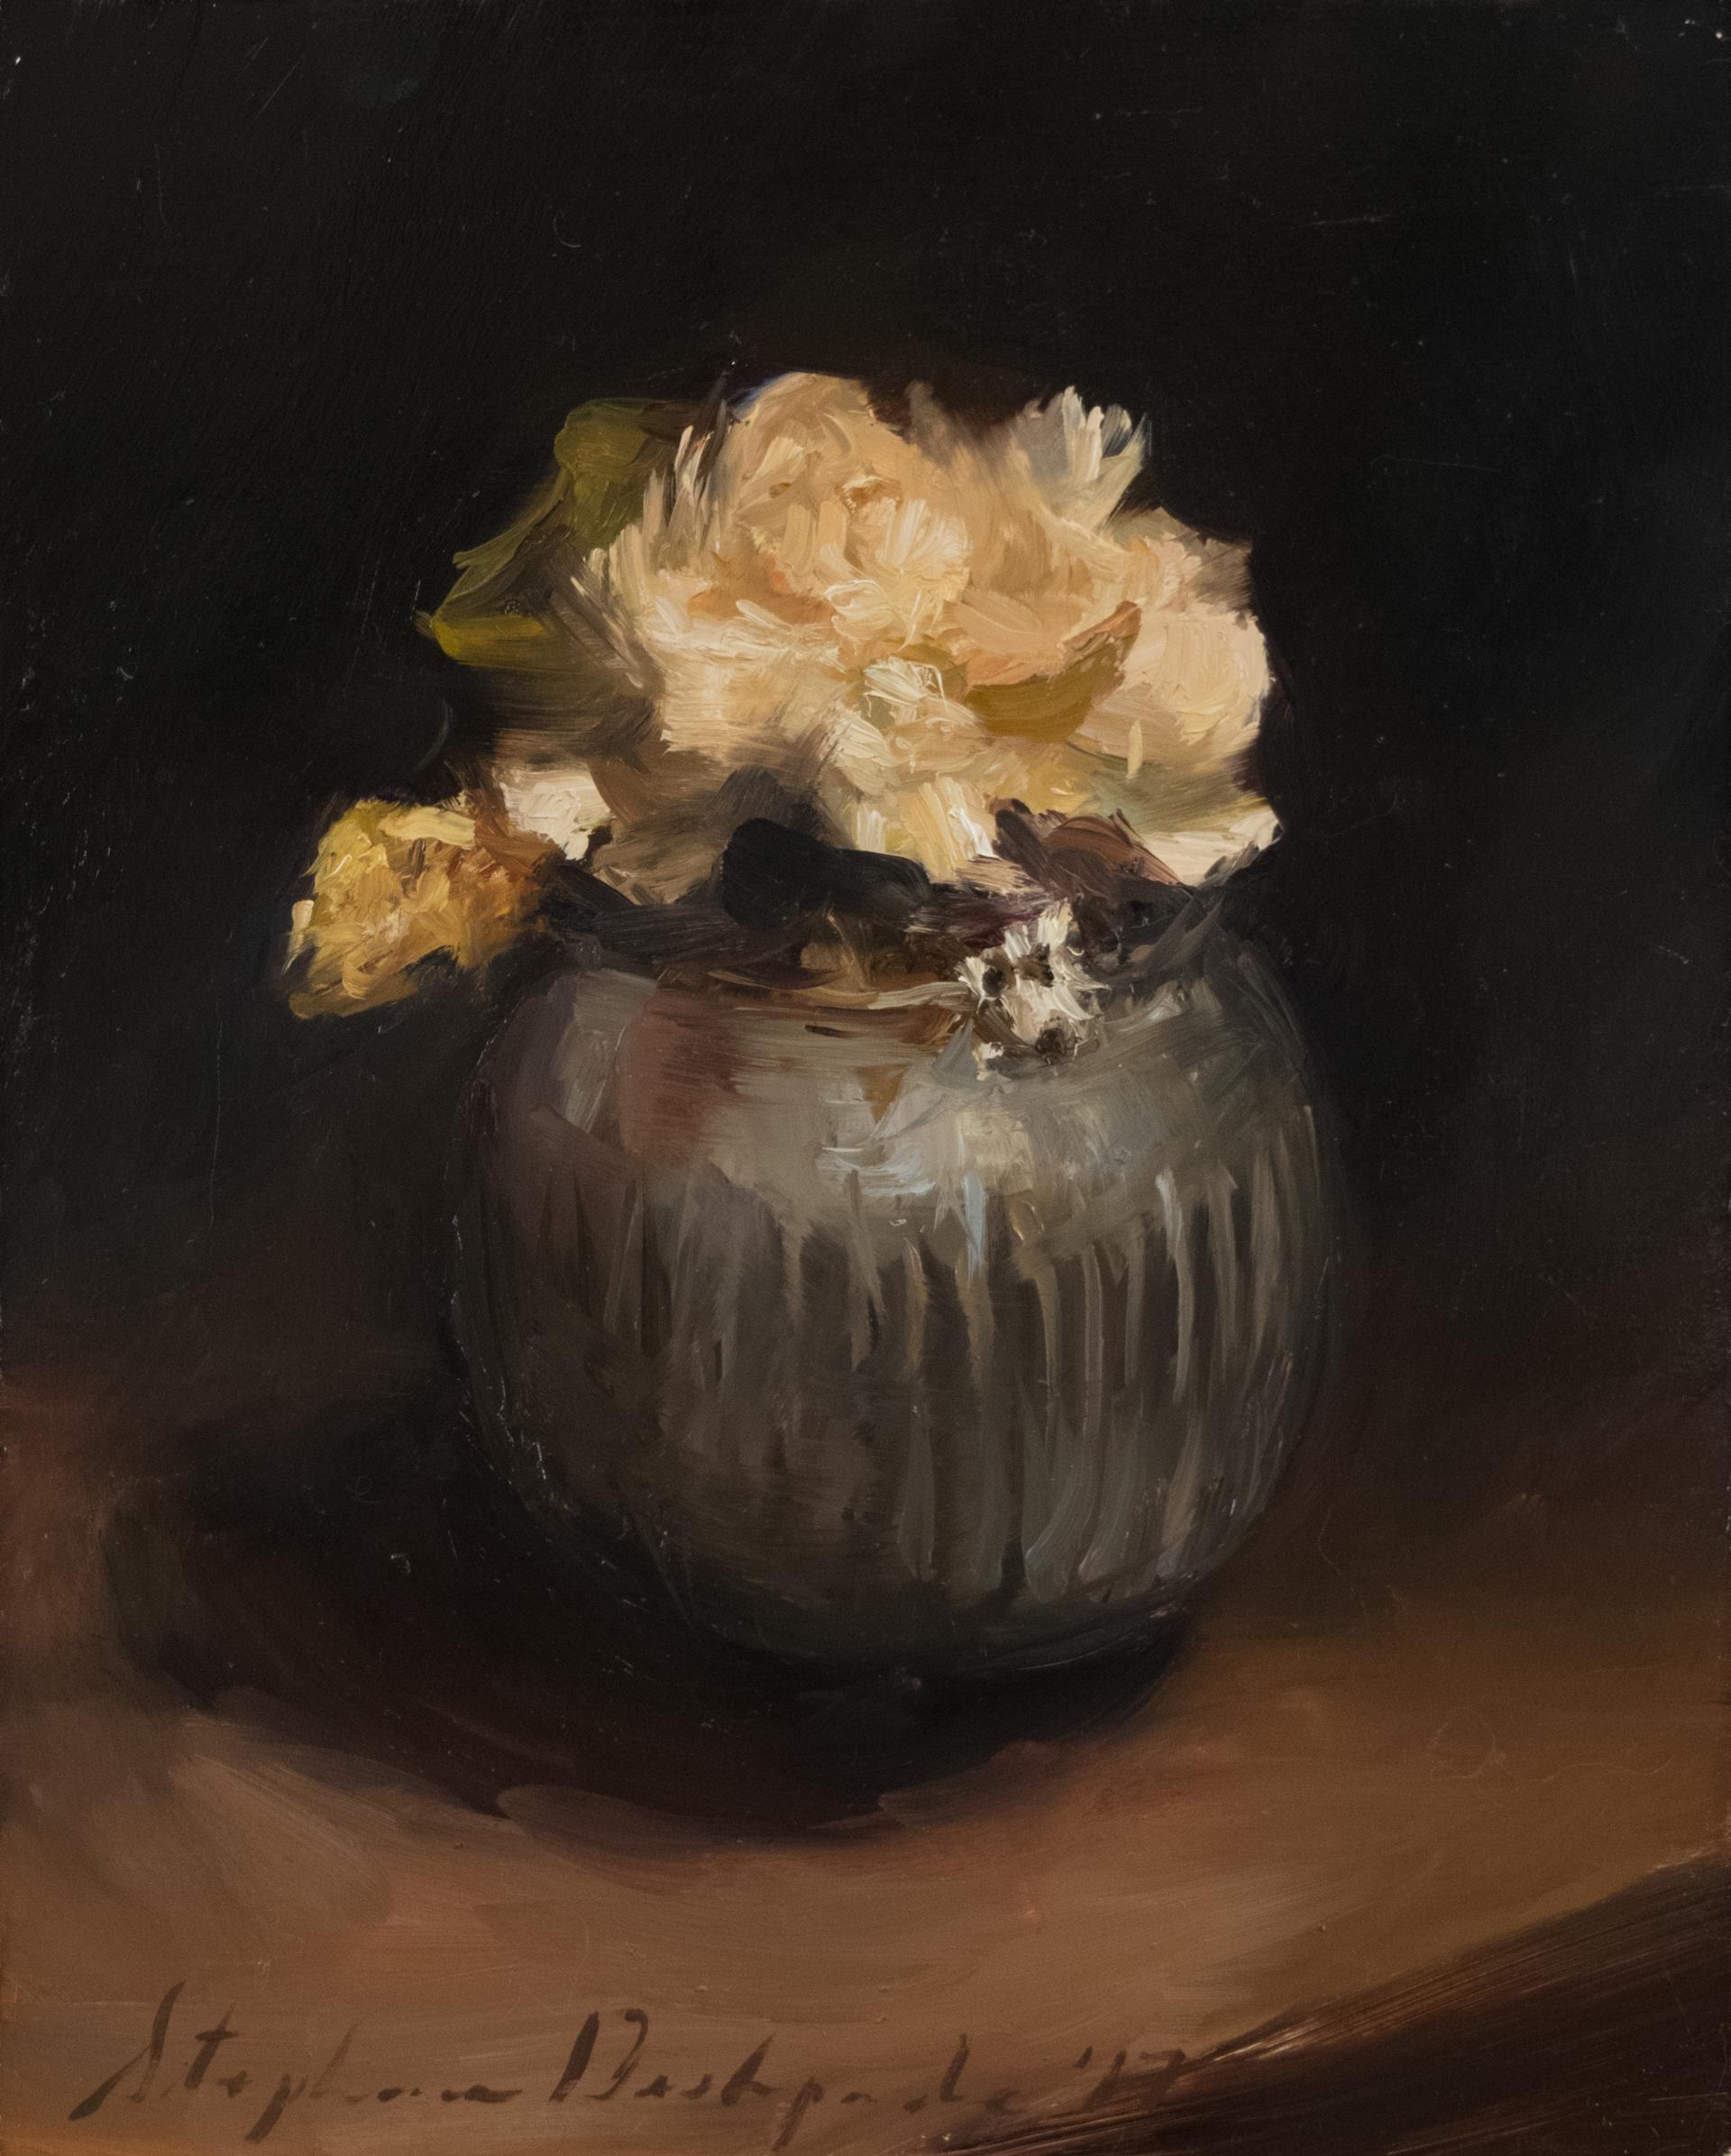 Dried Flowers by Stephanie Deshpande